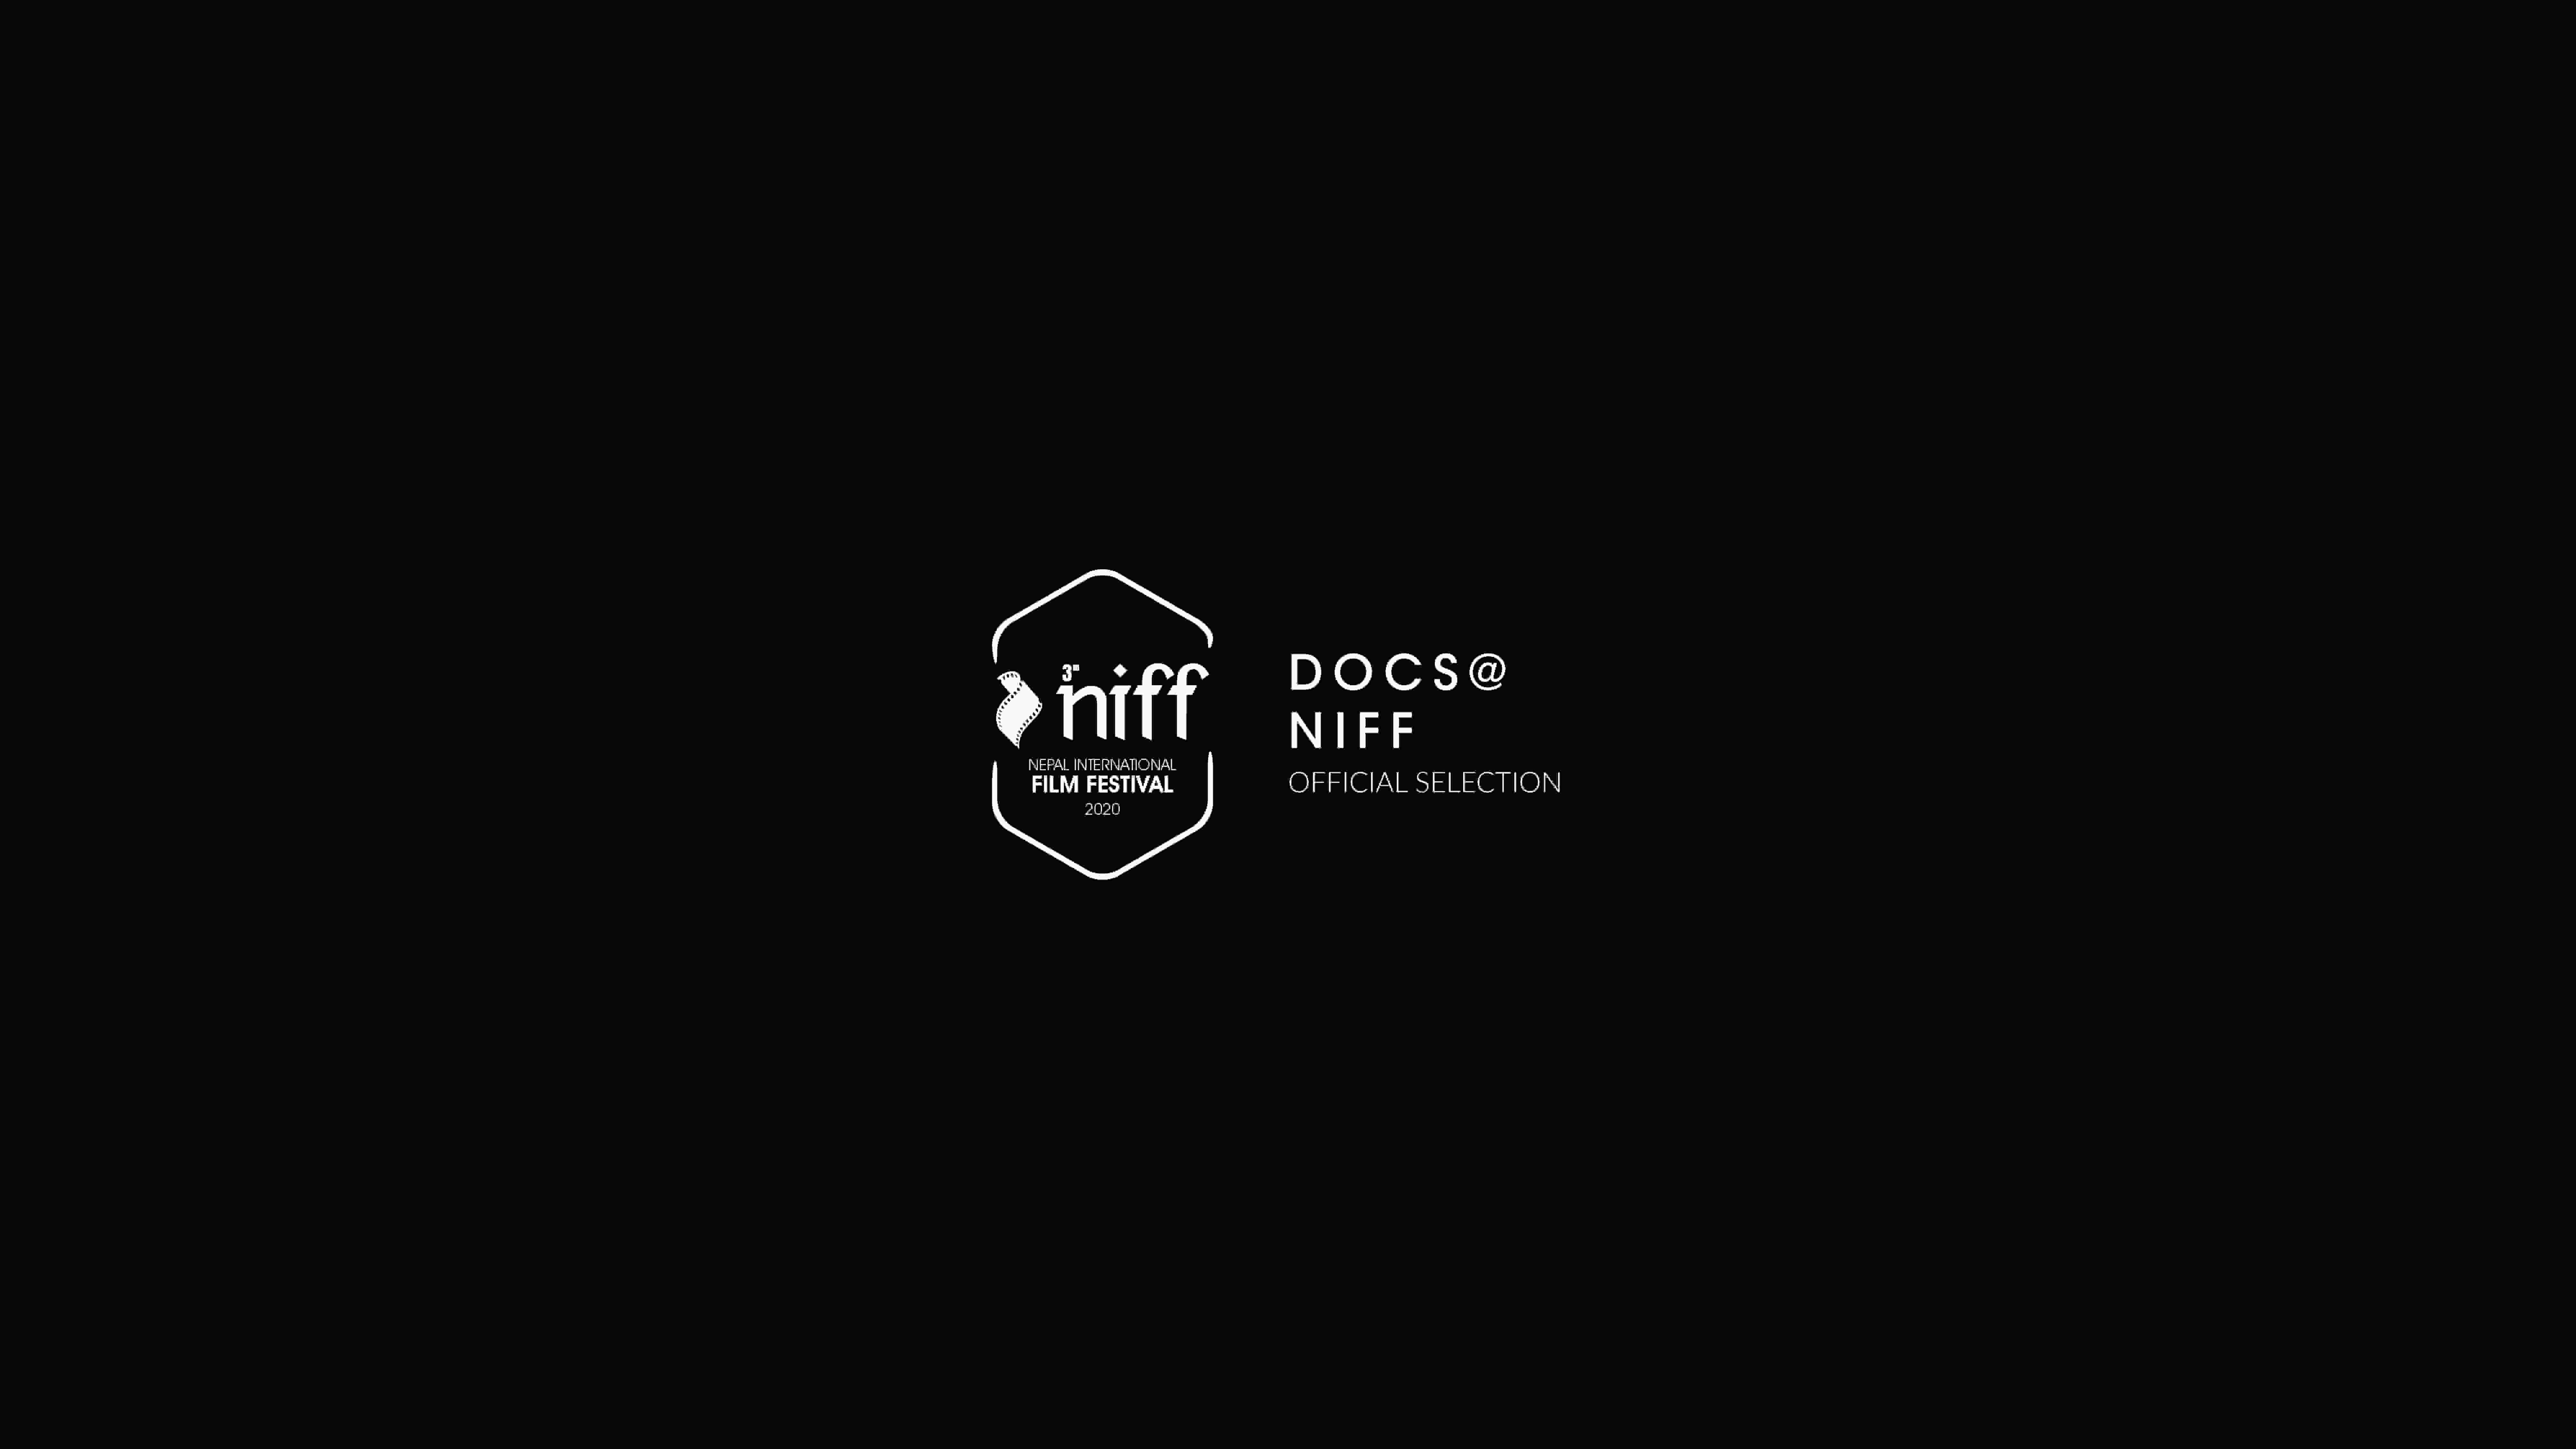 Docs@NIFF